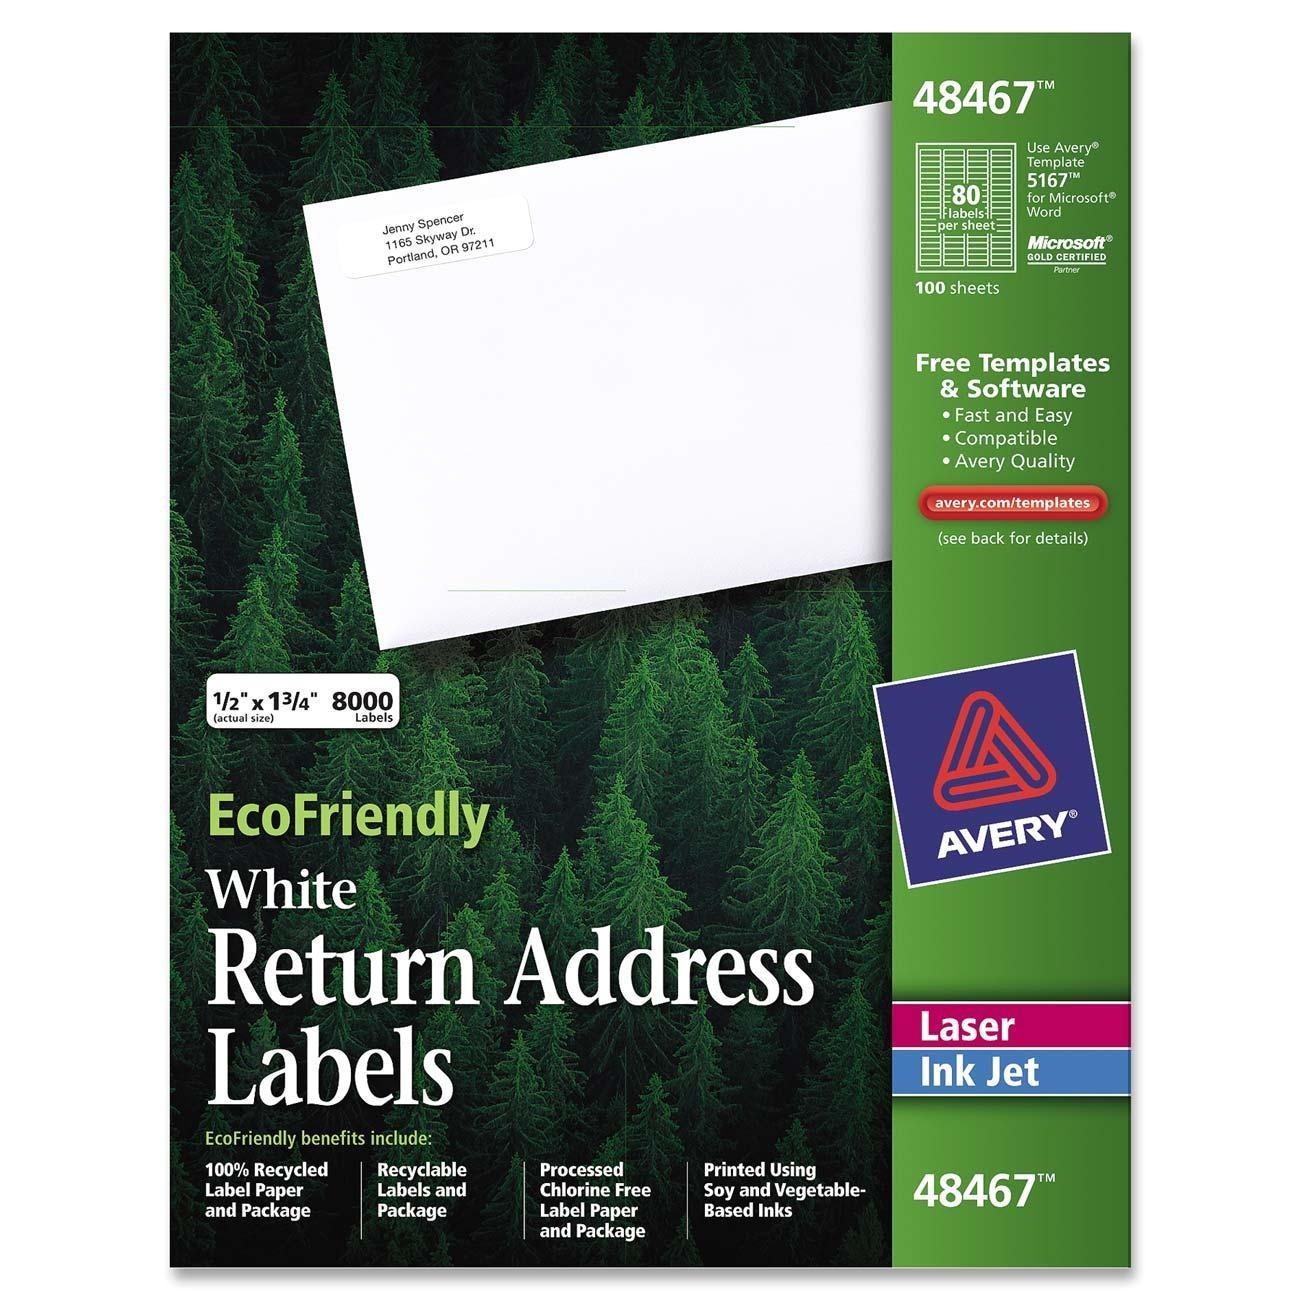 Avery Templates Return Address Labels Ecofriendly Return Address Label Avery Dennison 48467